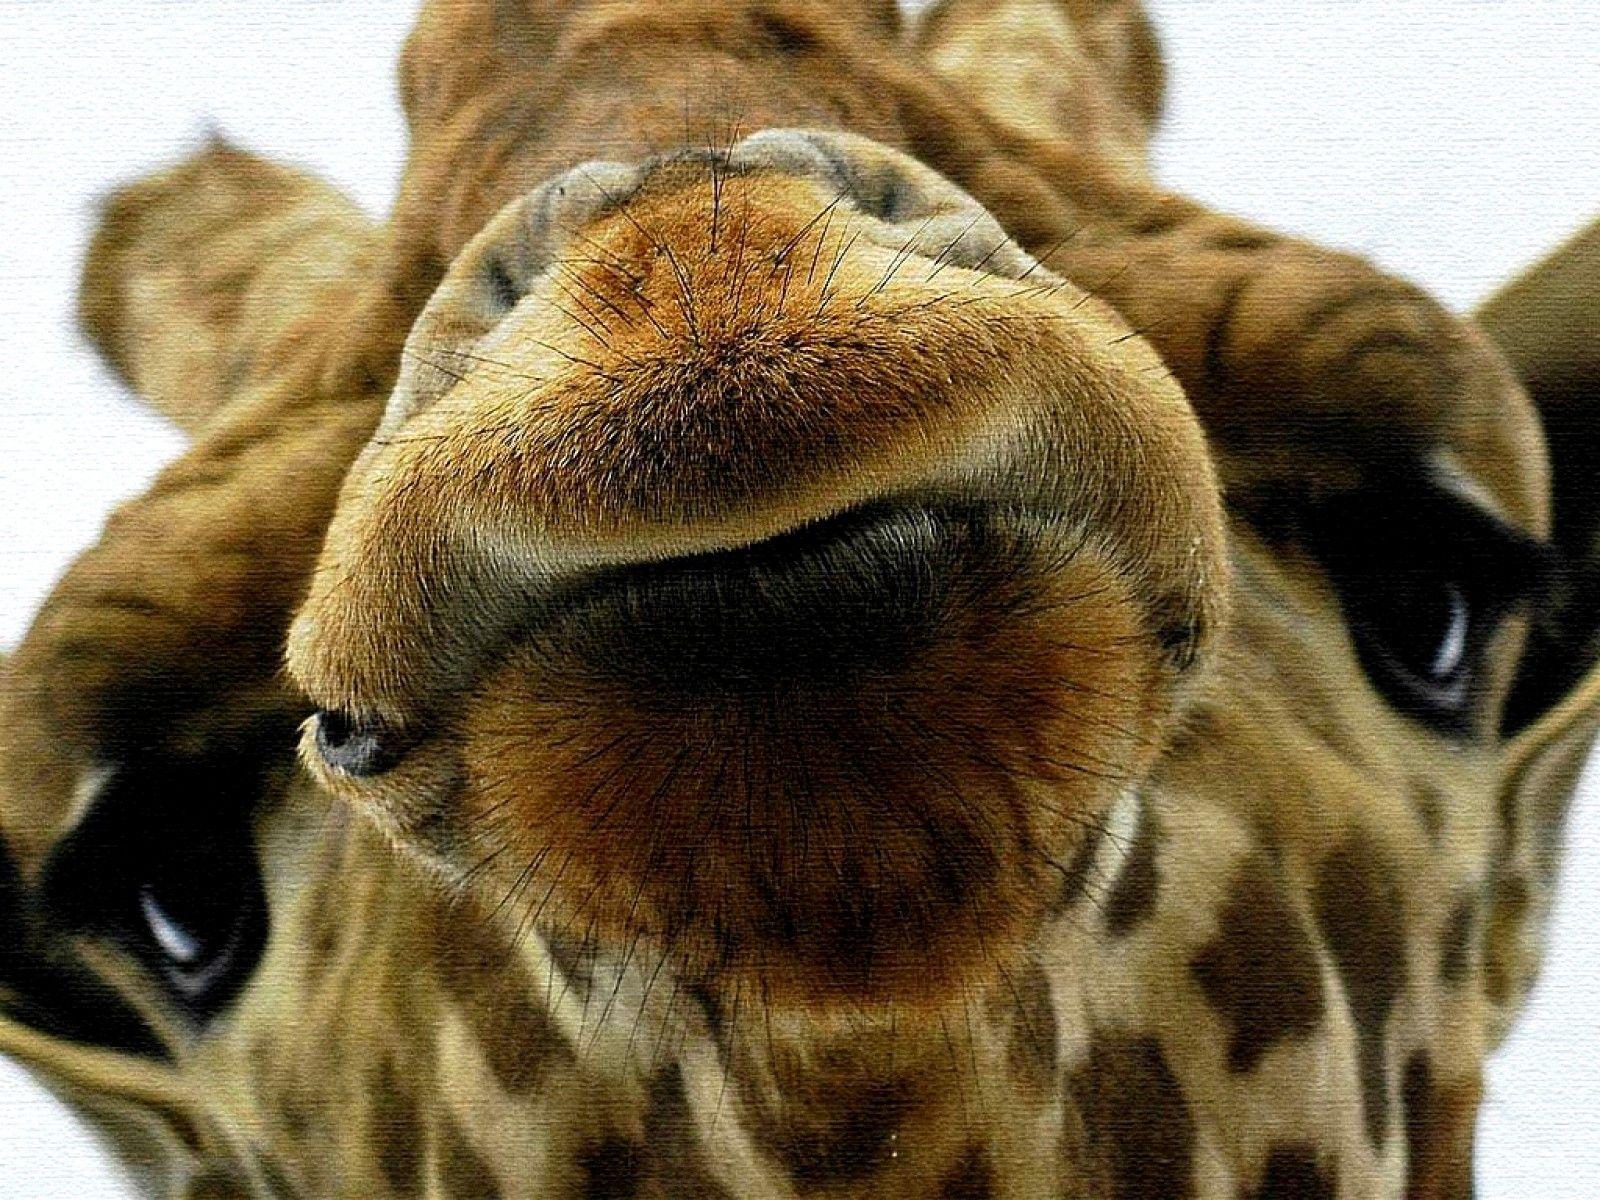 Giraffe Wallpapers Backgrounds Images FreeCreatives